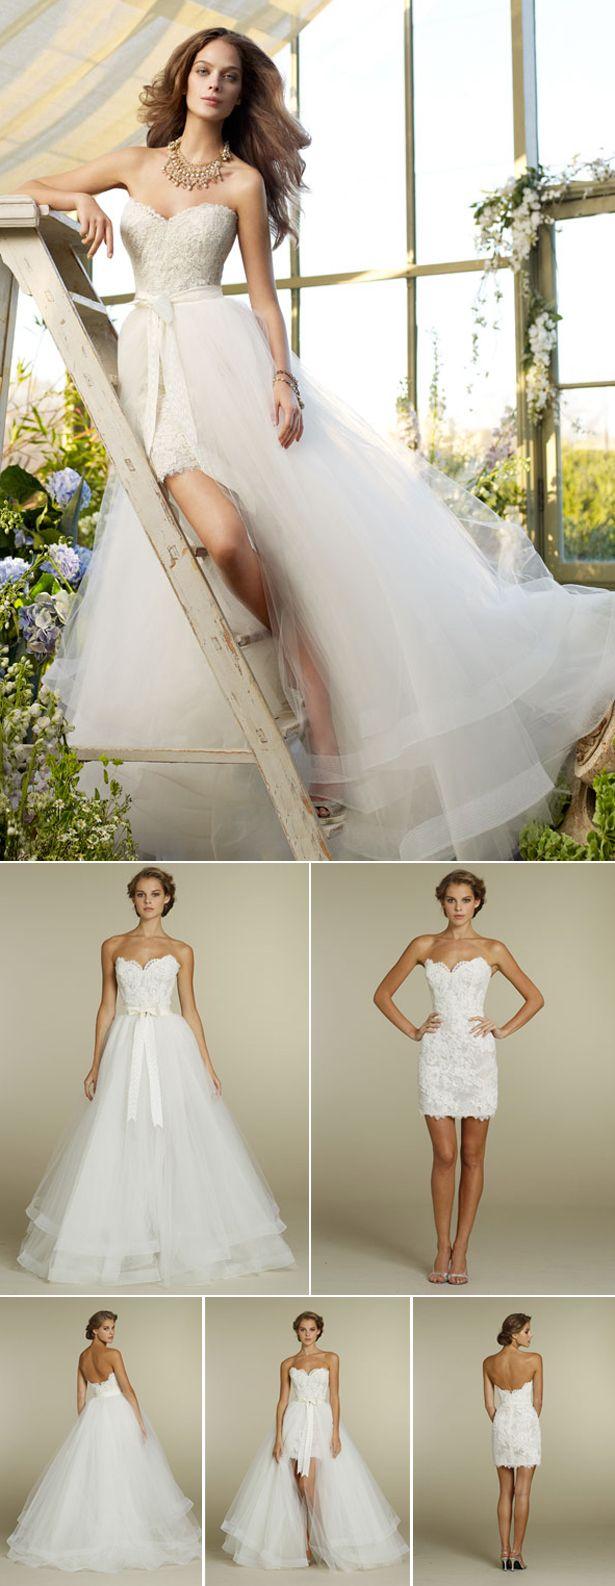 Best 25 High low wedding dresses ideas only on Pinterest Tall